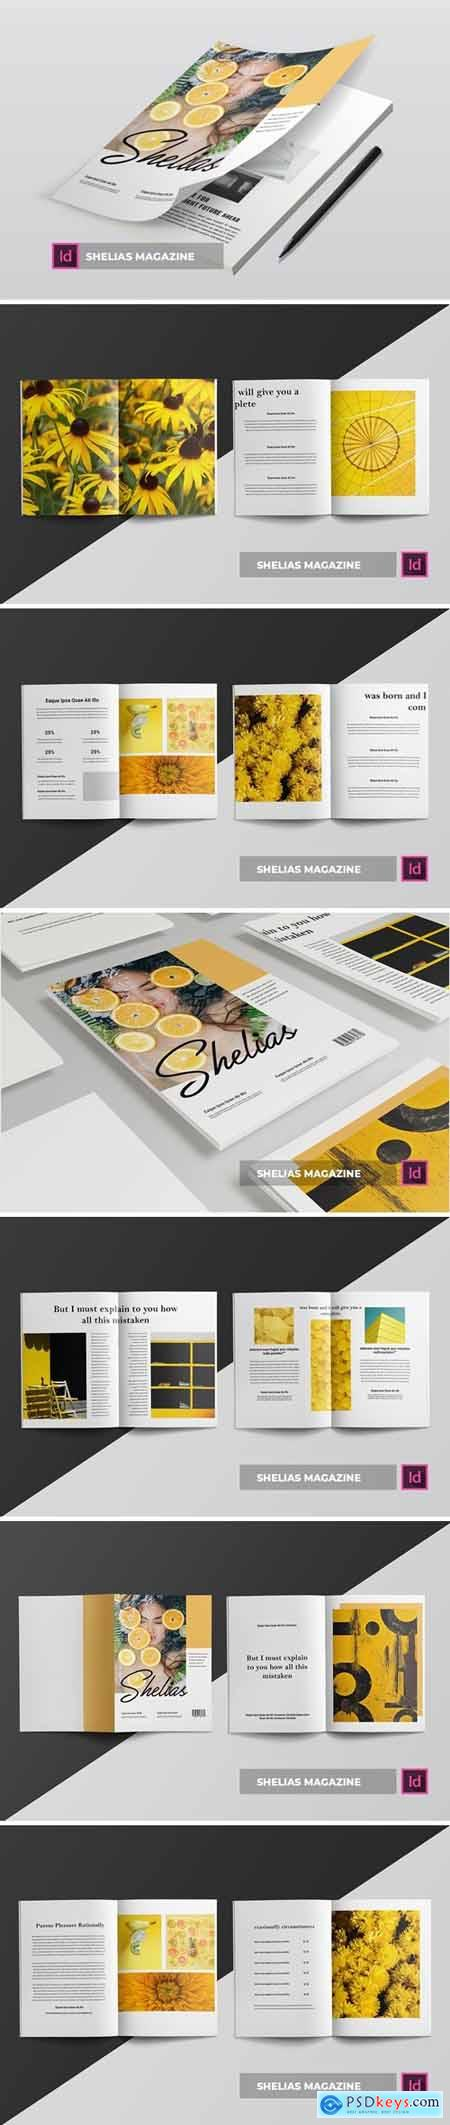 Shelias Magazine Template